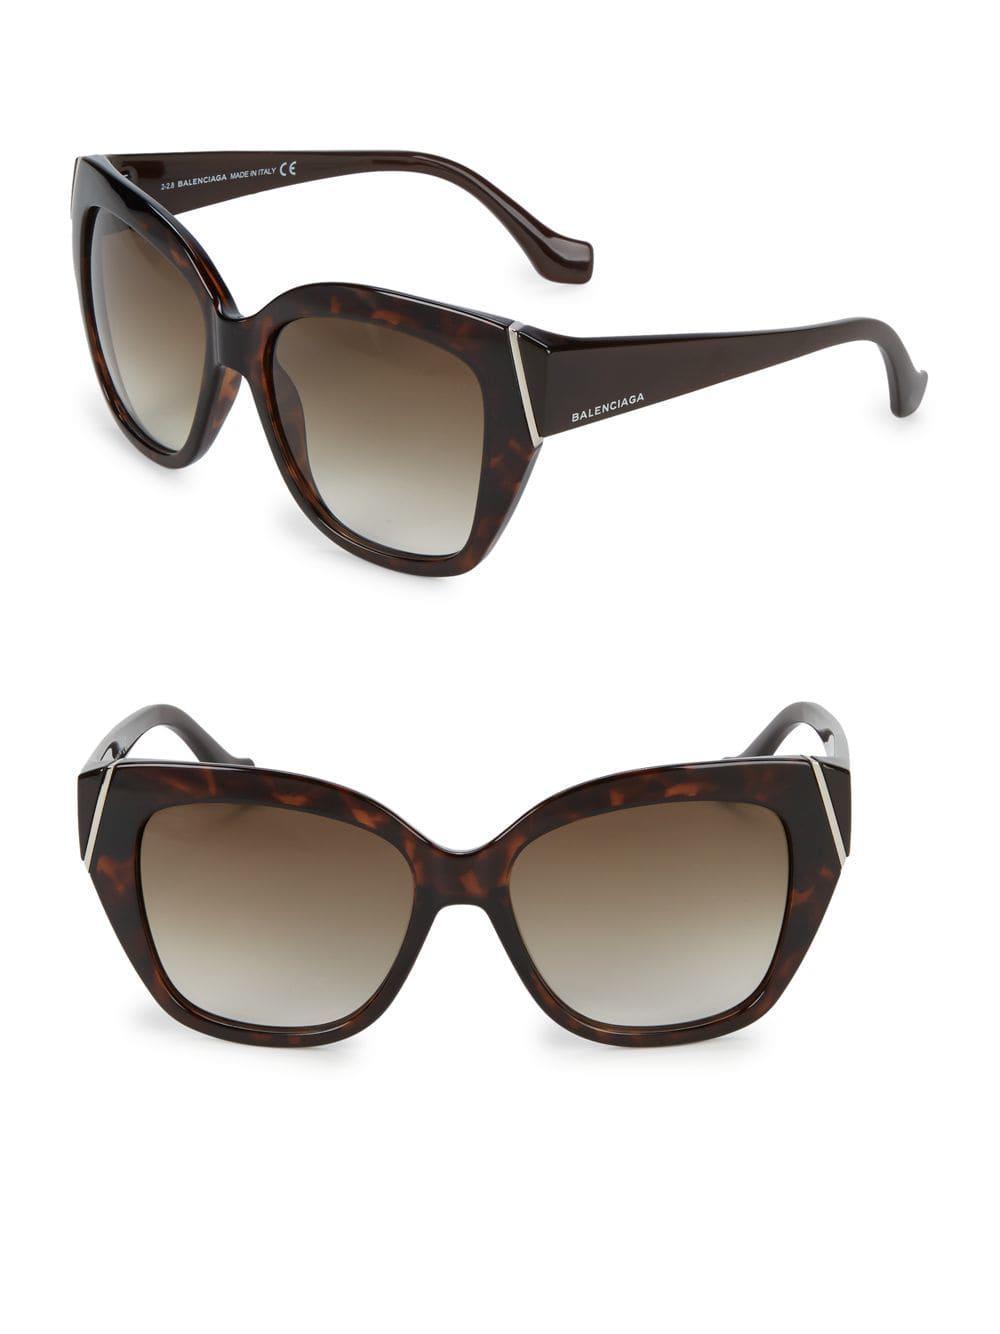 d58ad4b9f4e Balenciaga - Brown Injected Tortoiseshell 57mm Square Sunglasses - Lyst.  View fullscreen